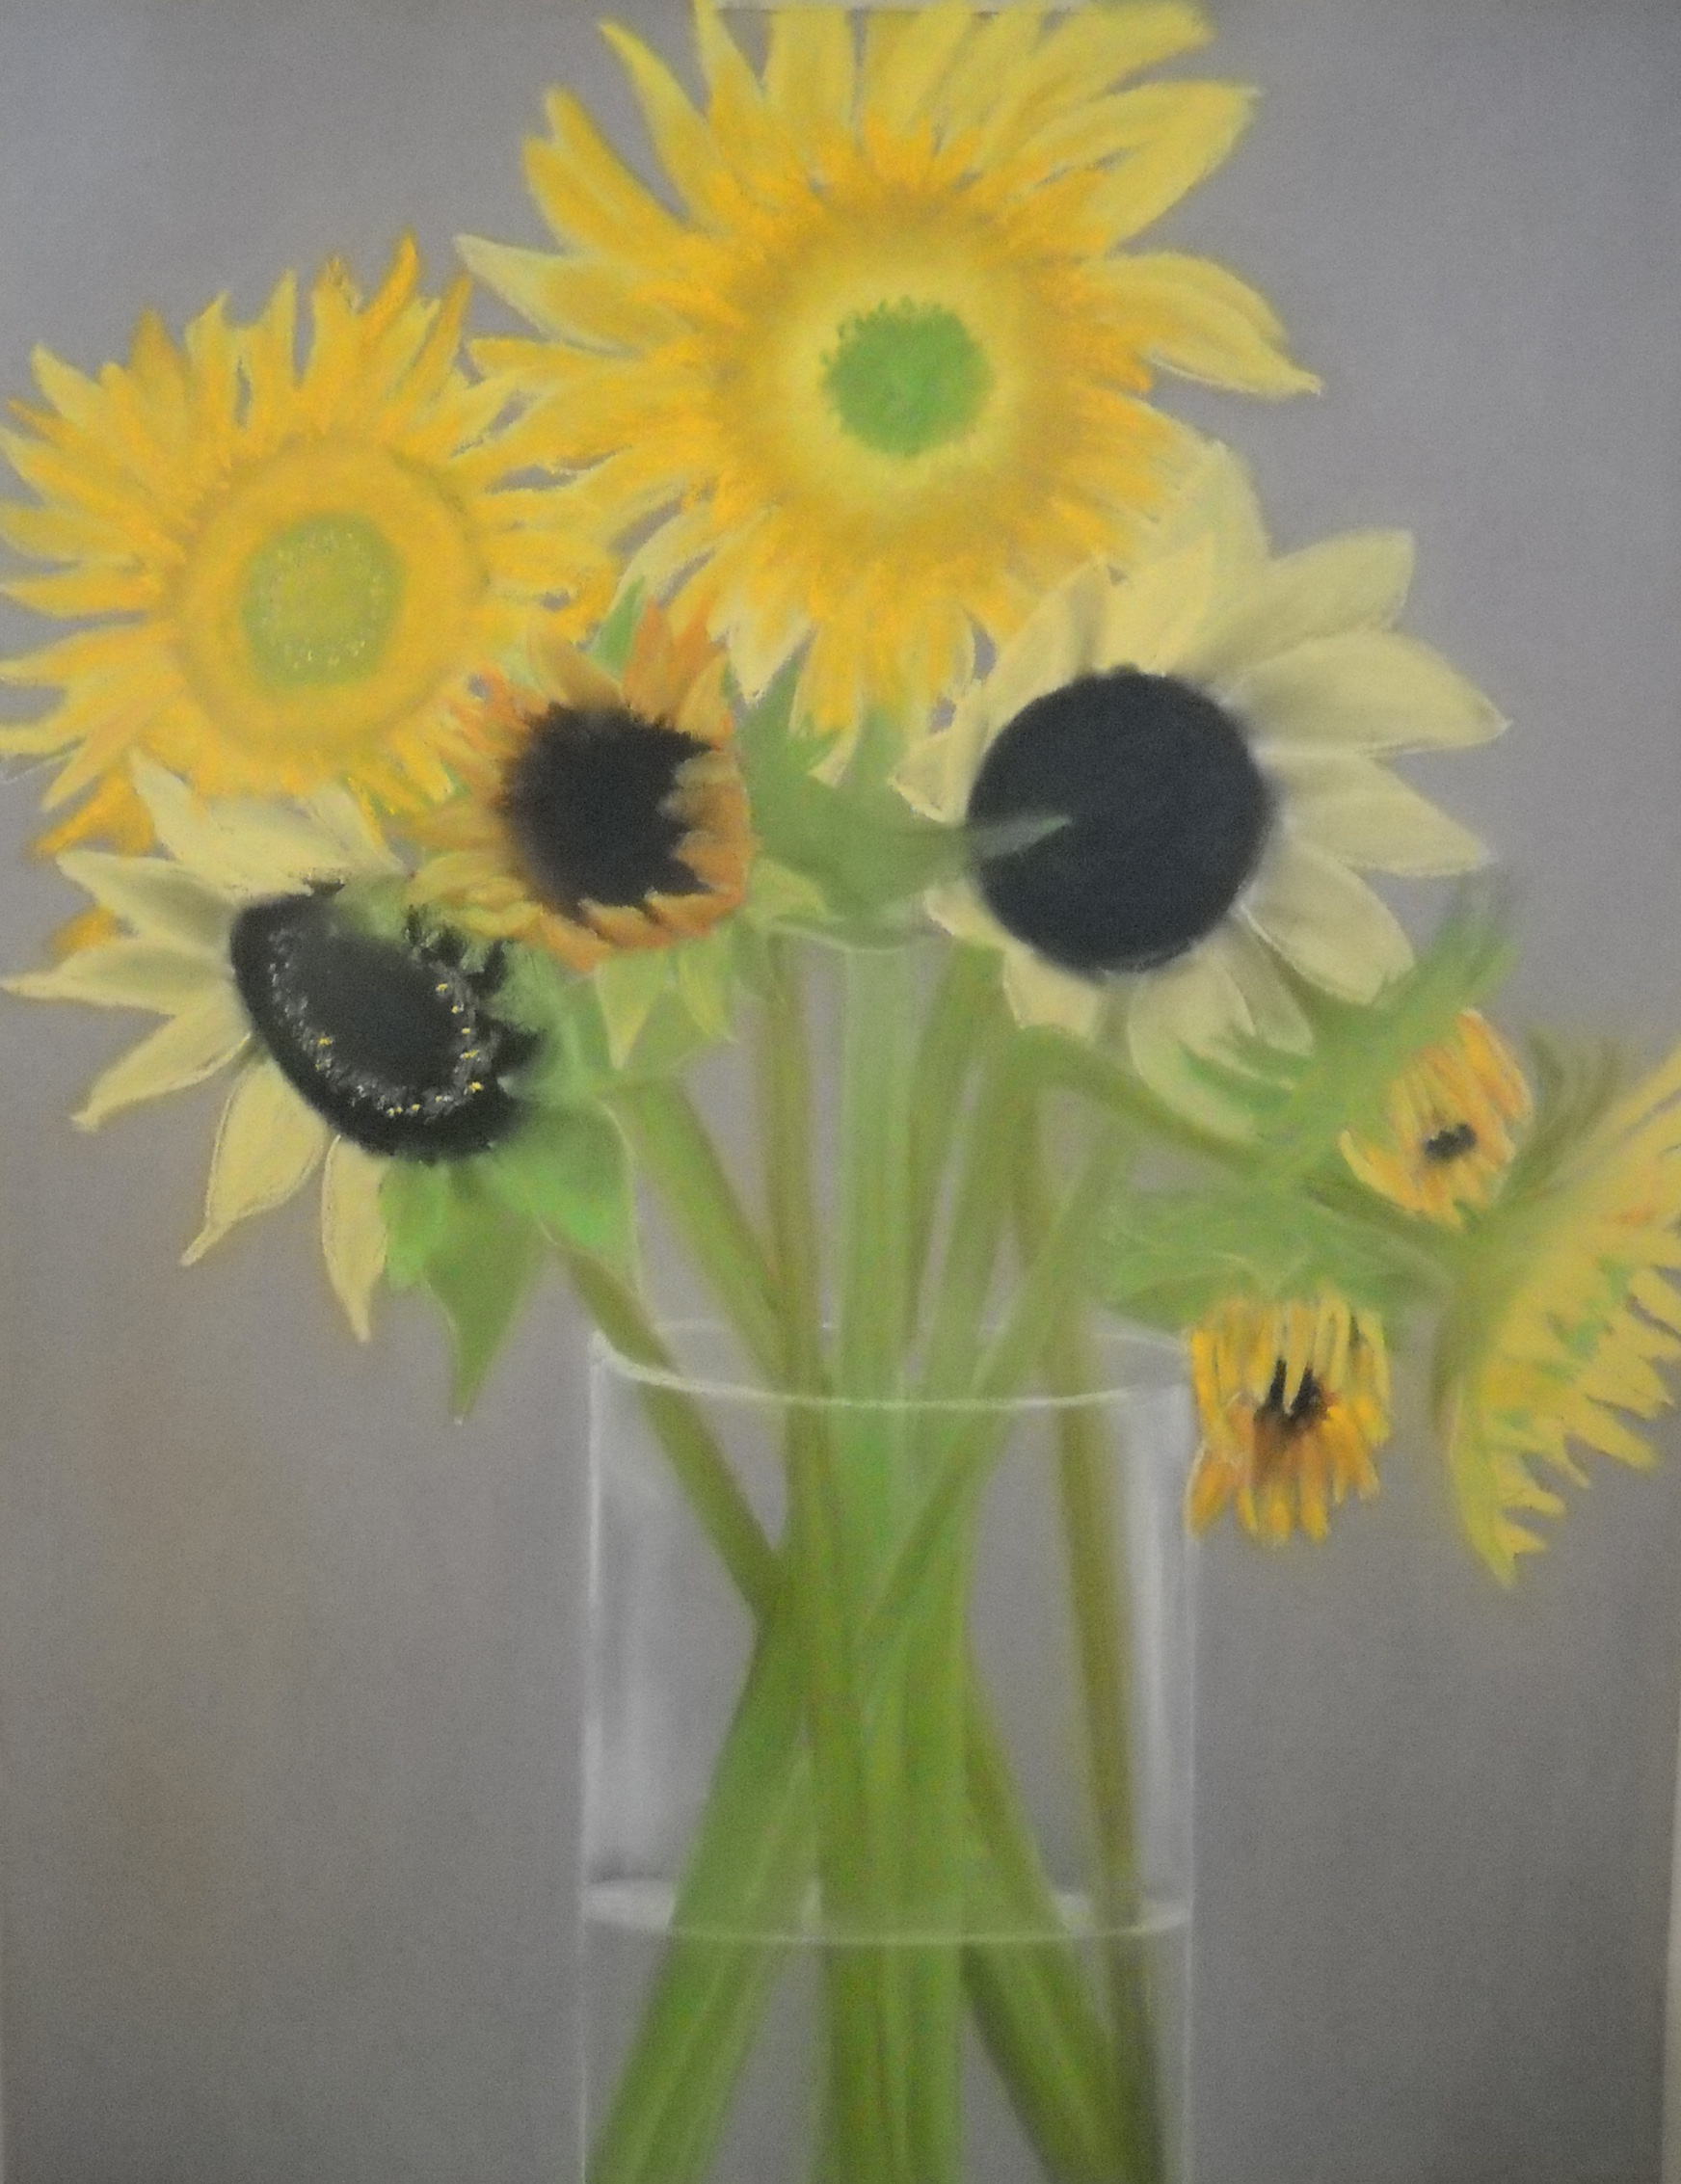 Medley of Sunflowers